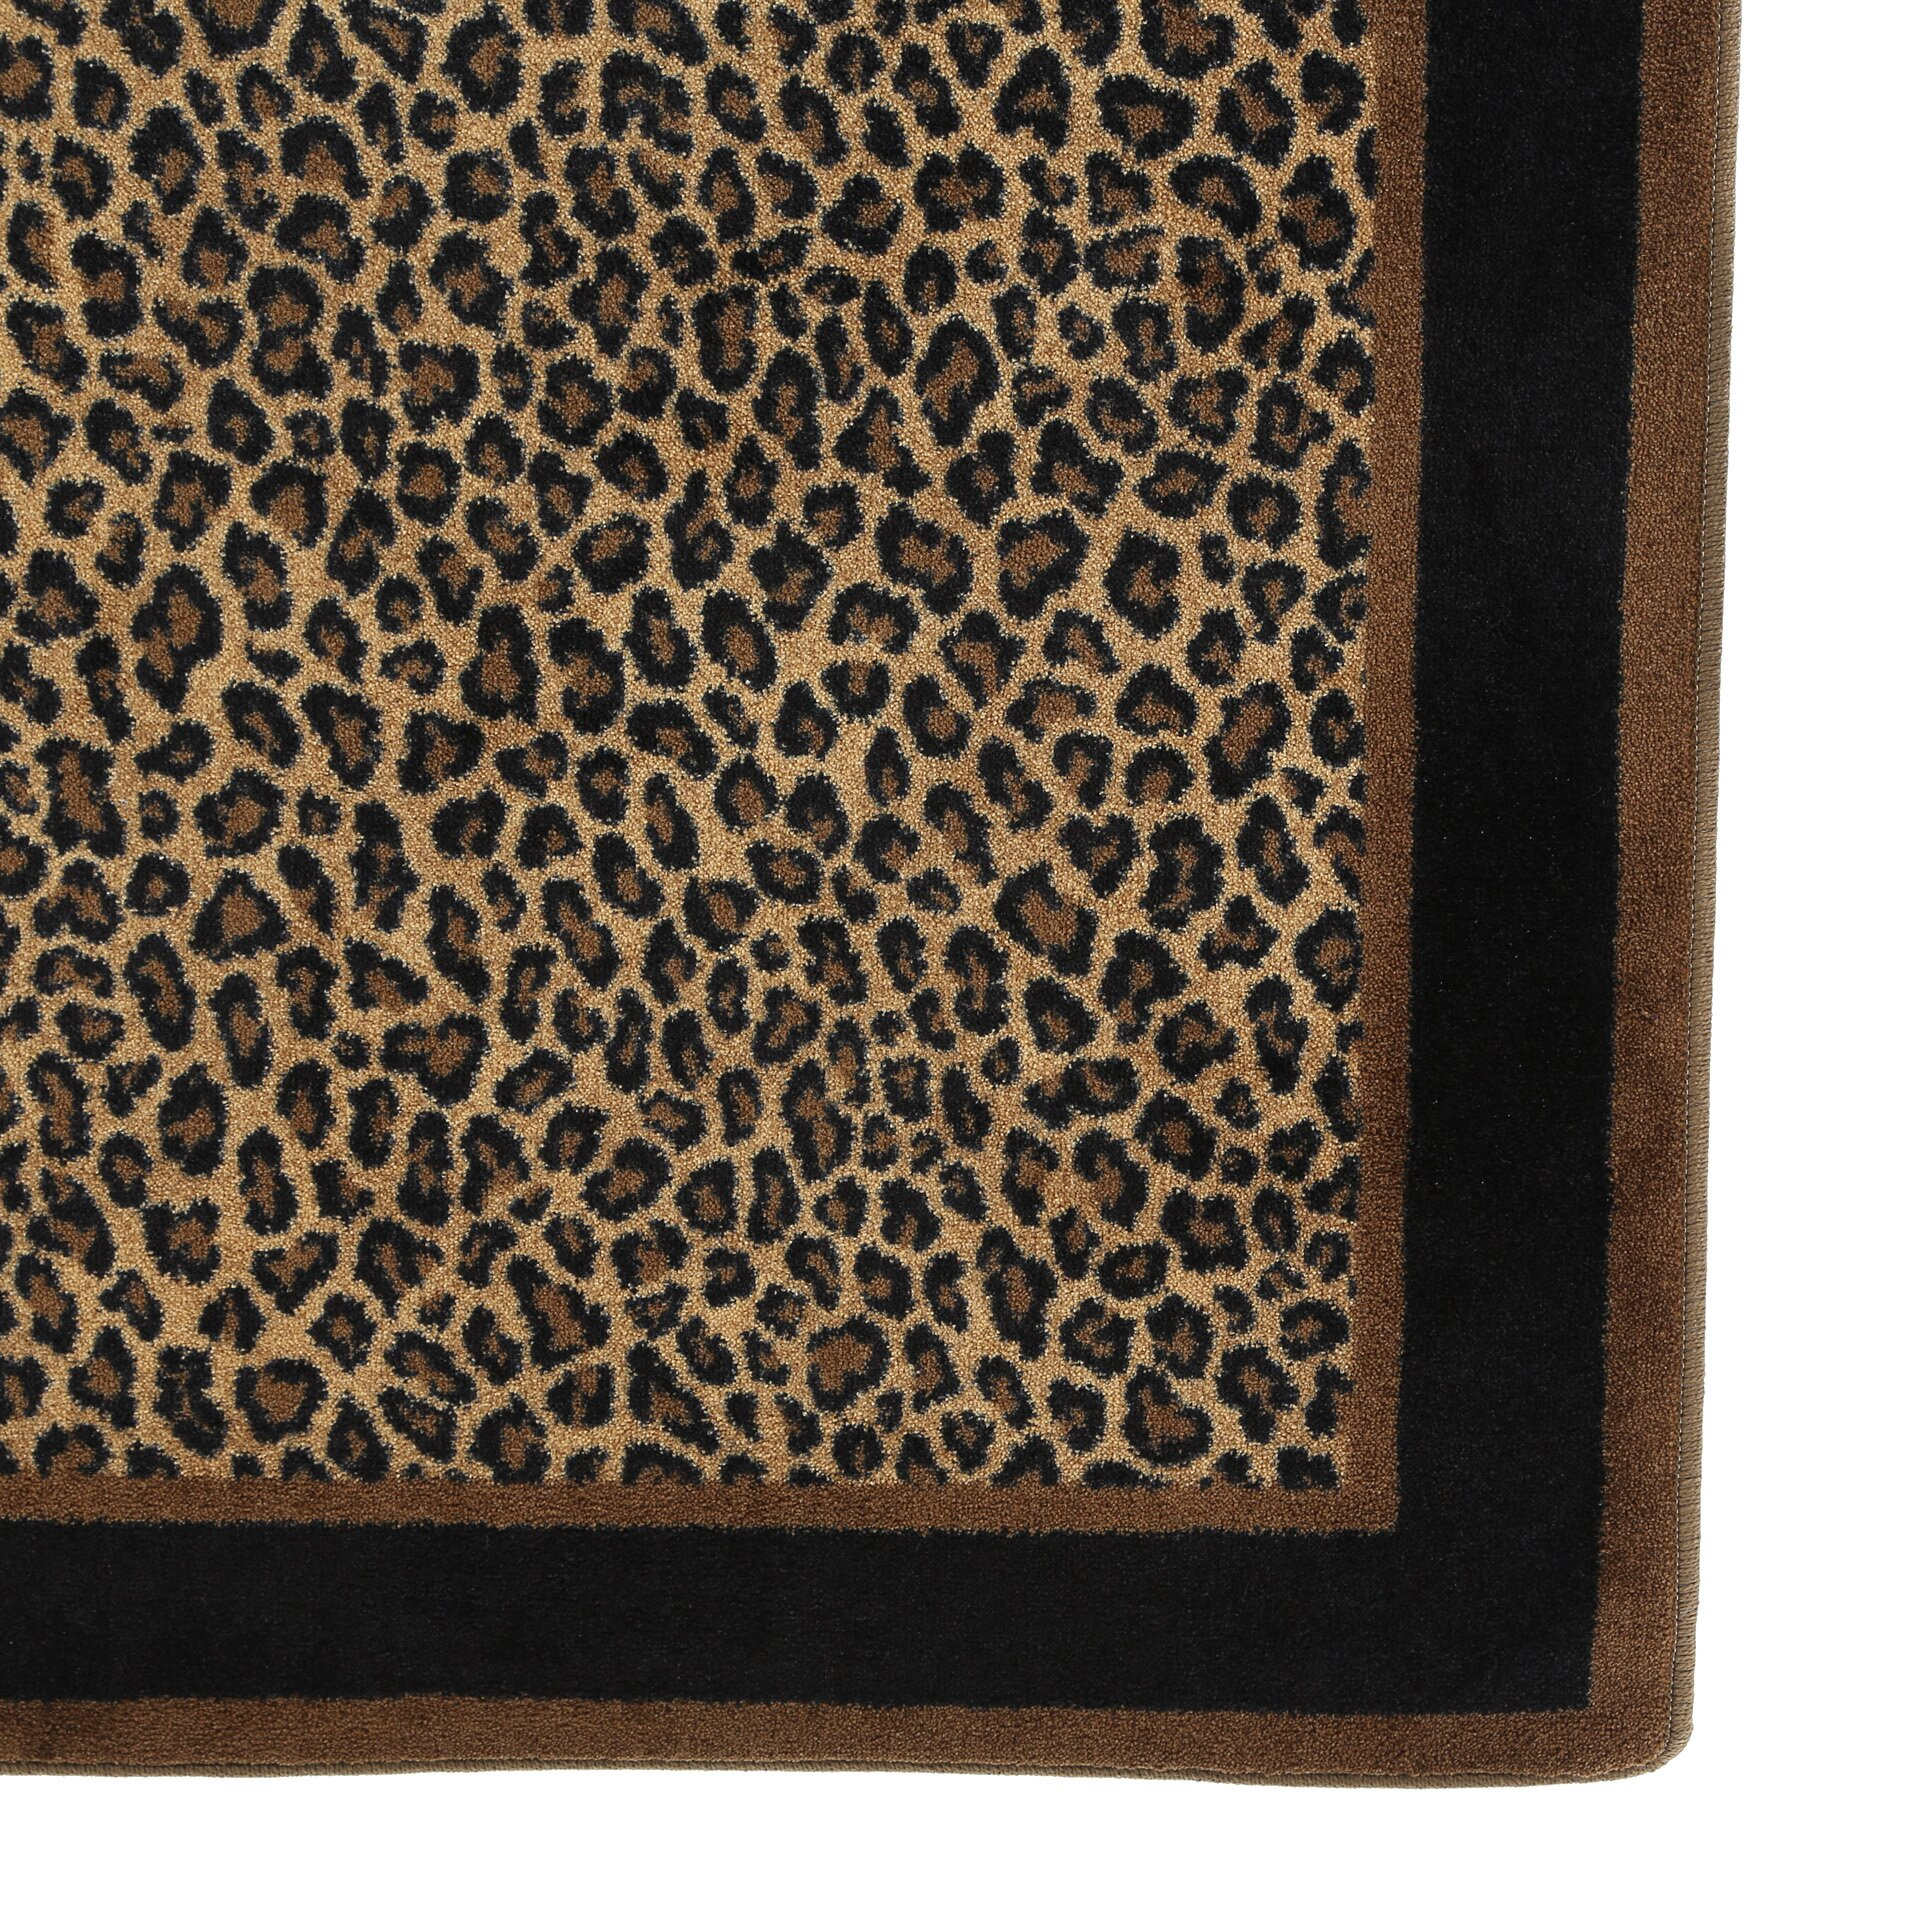 Leopard Print Area Rug Part - 39: Milliken Innovation Leopard Print Zimbala Area Rug